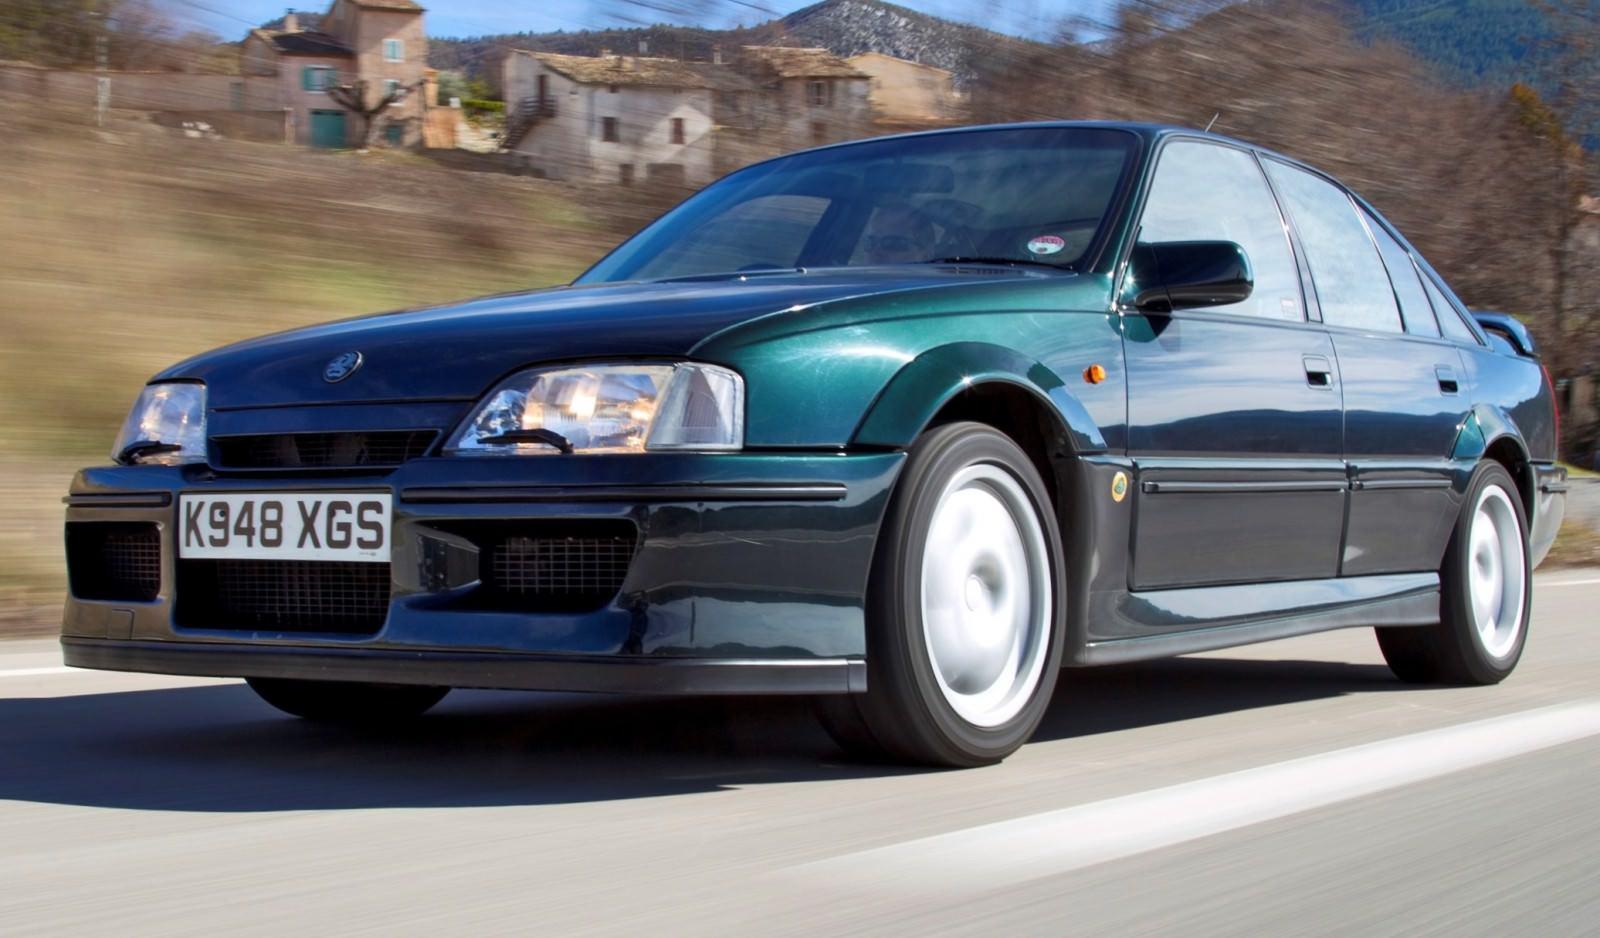 1993 Vauxhall Lotus Carlton 26